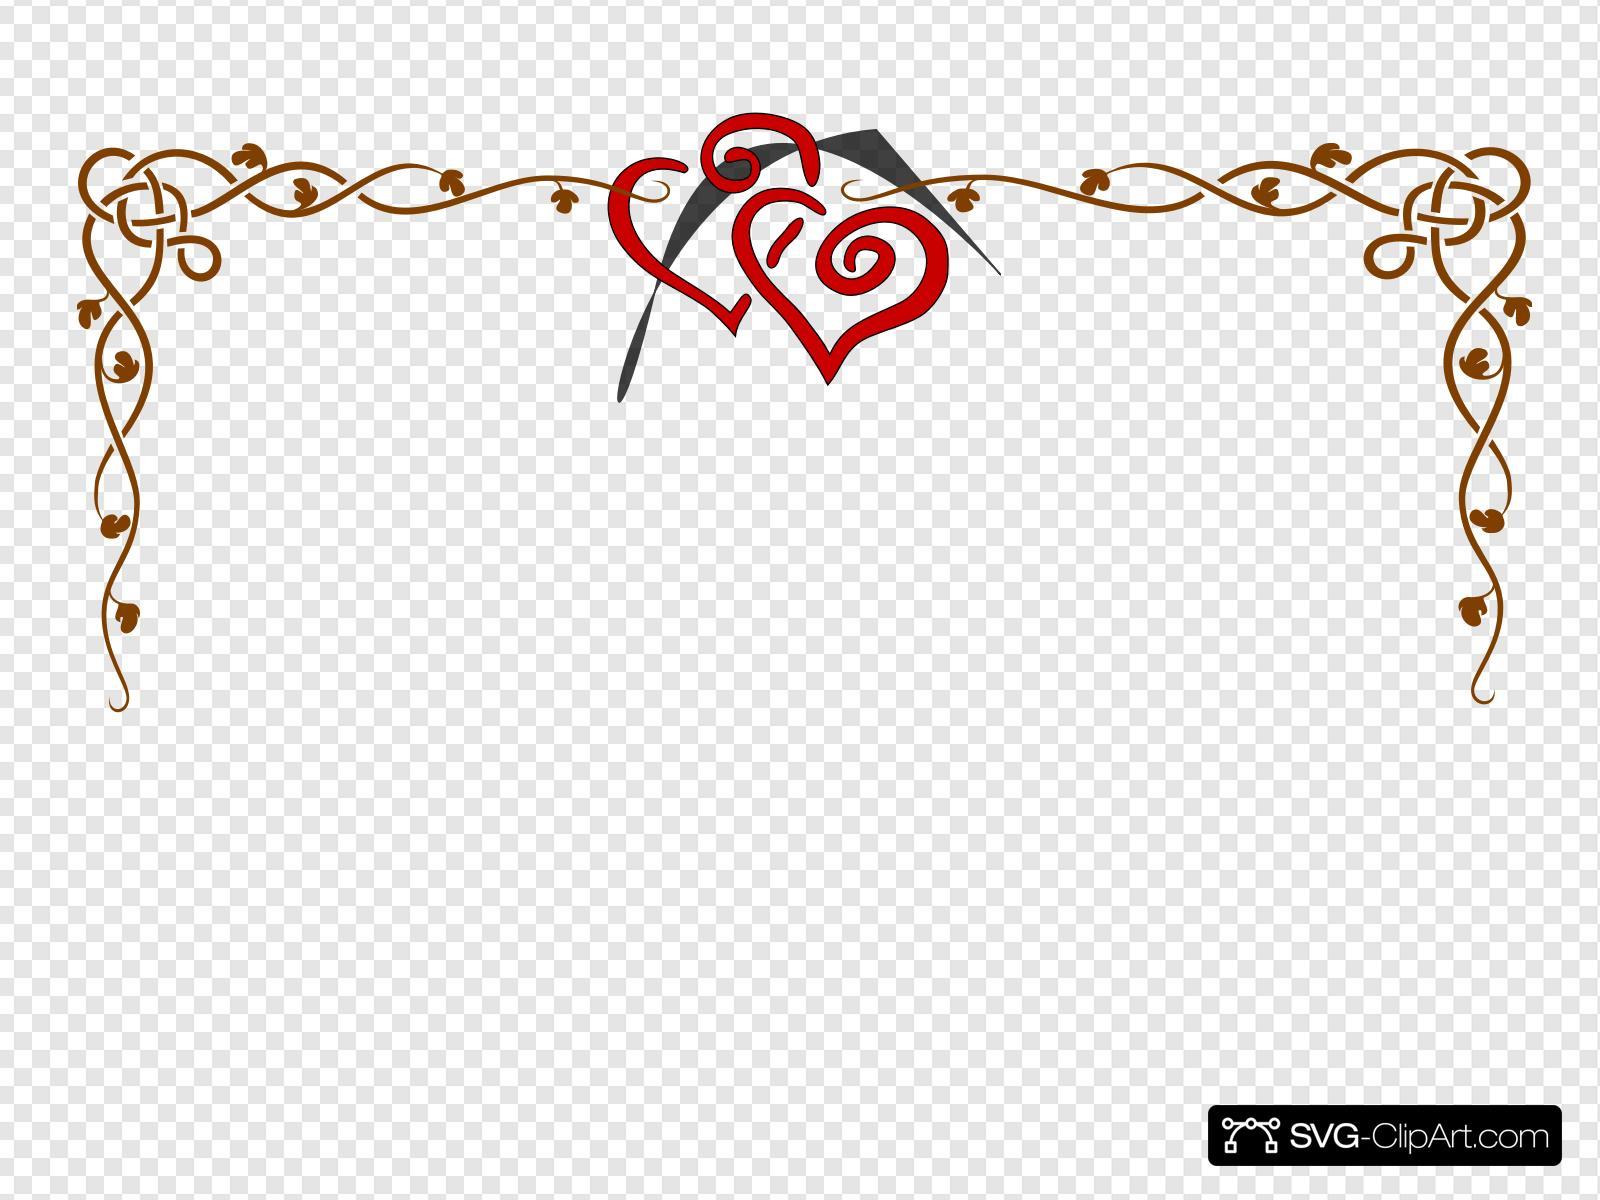 Hearts And Vine Clip art, Icon and SVG.